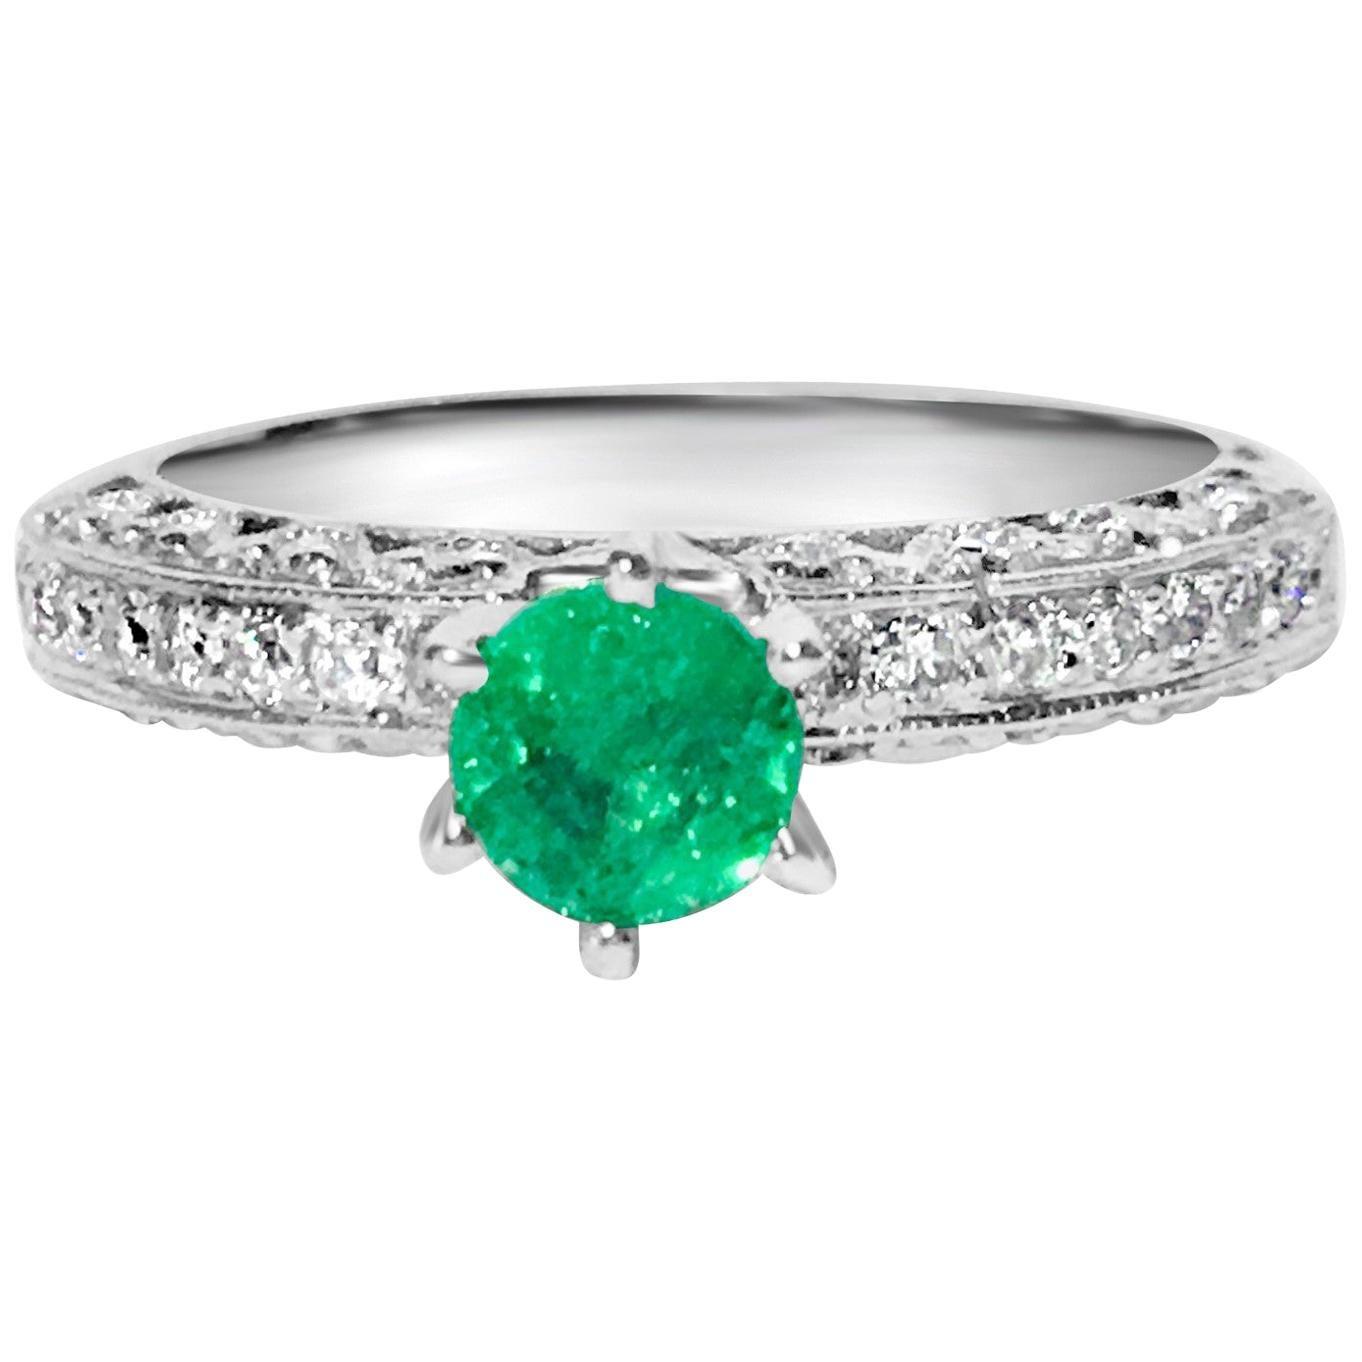 1.00 Carat Colombian Emerald Diamond Engagement Ring